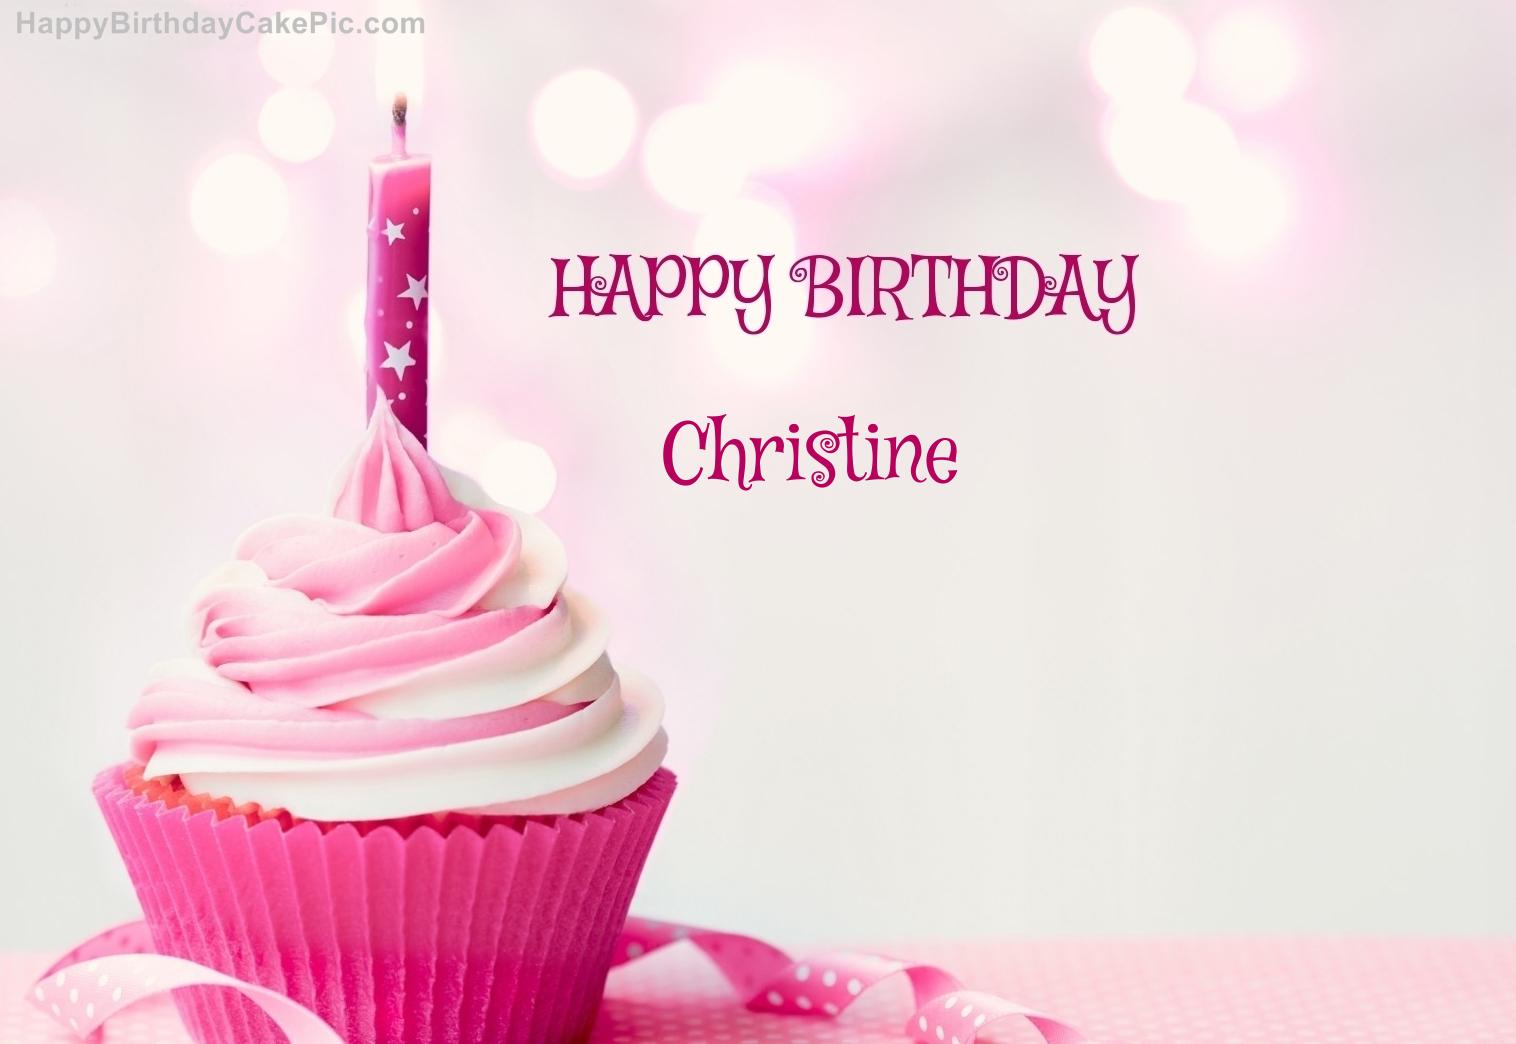 ️ Happy Birthday Cupcake Candle Pink Cake For Christine